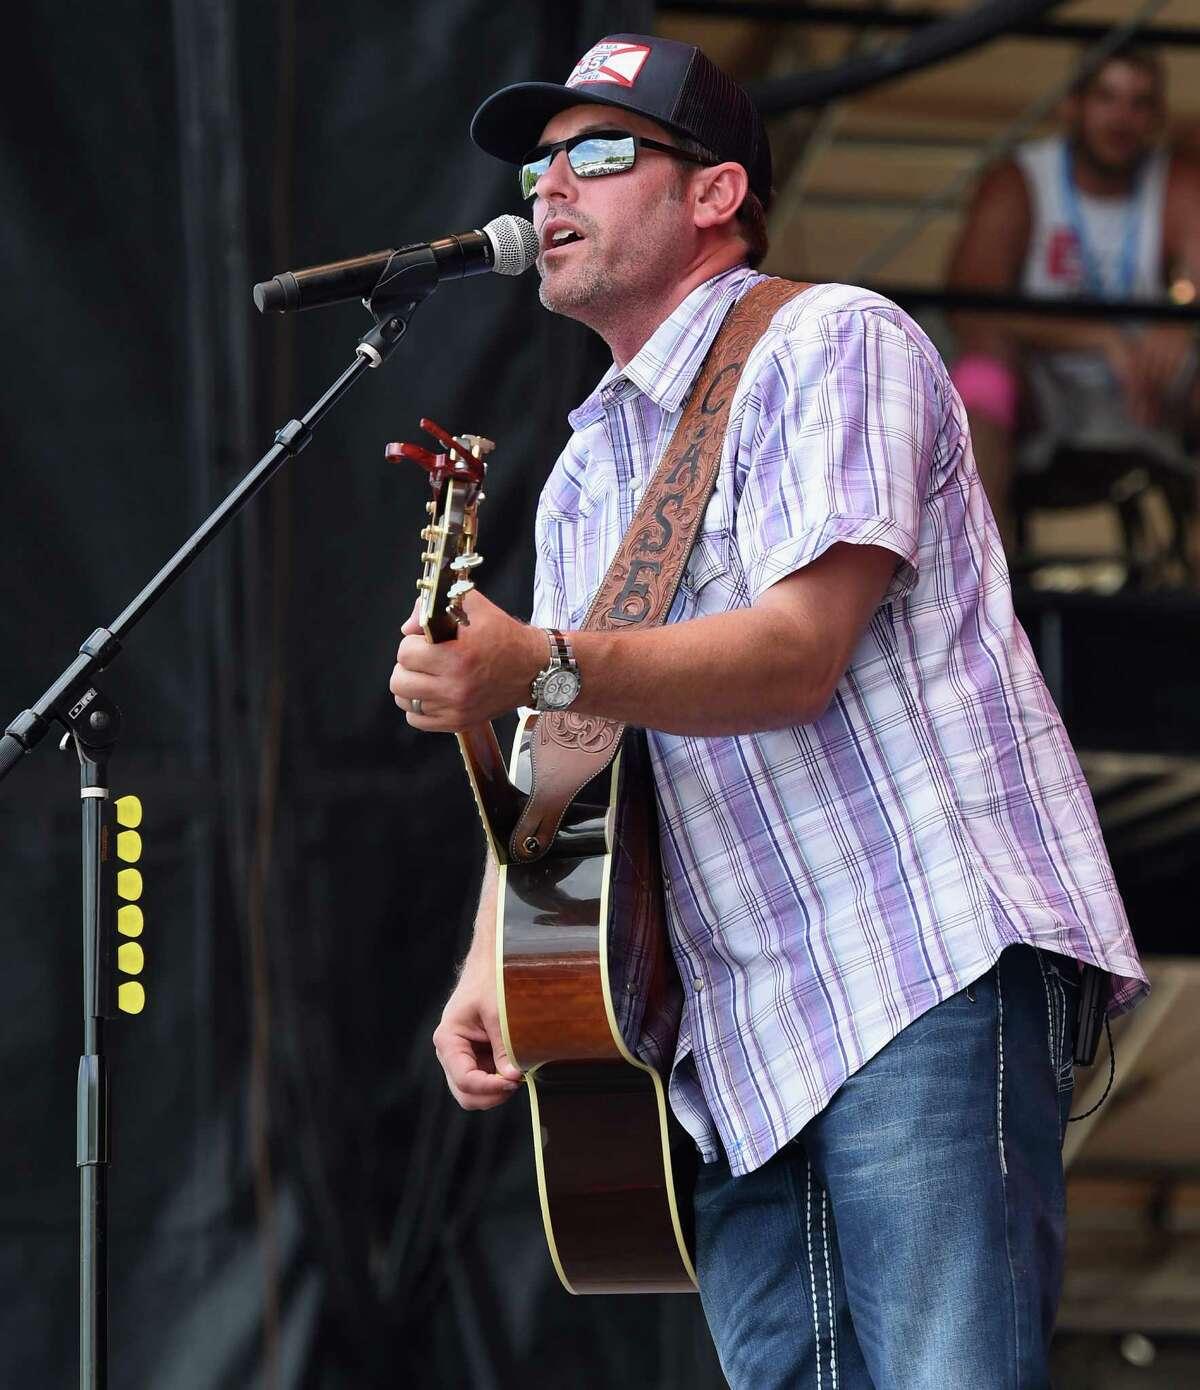 MANHATTAN, KS - JUNE 25: Singer/Songwriter Casey Donahew performs at Kicker Country Stampede Manhattan, Kansas - Day 3 on June 25, 2016 in Manhattan, Kansas.